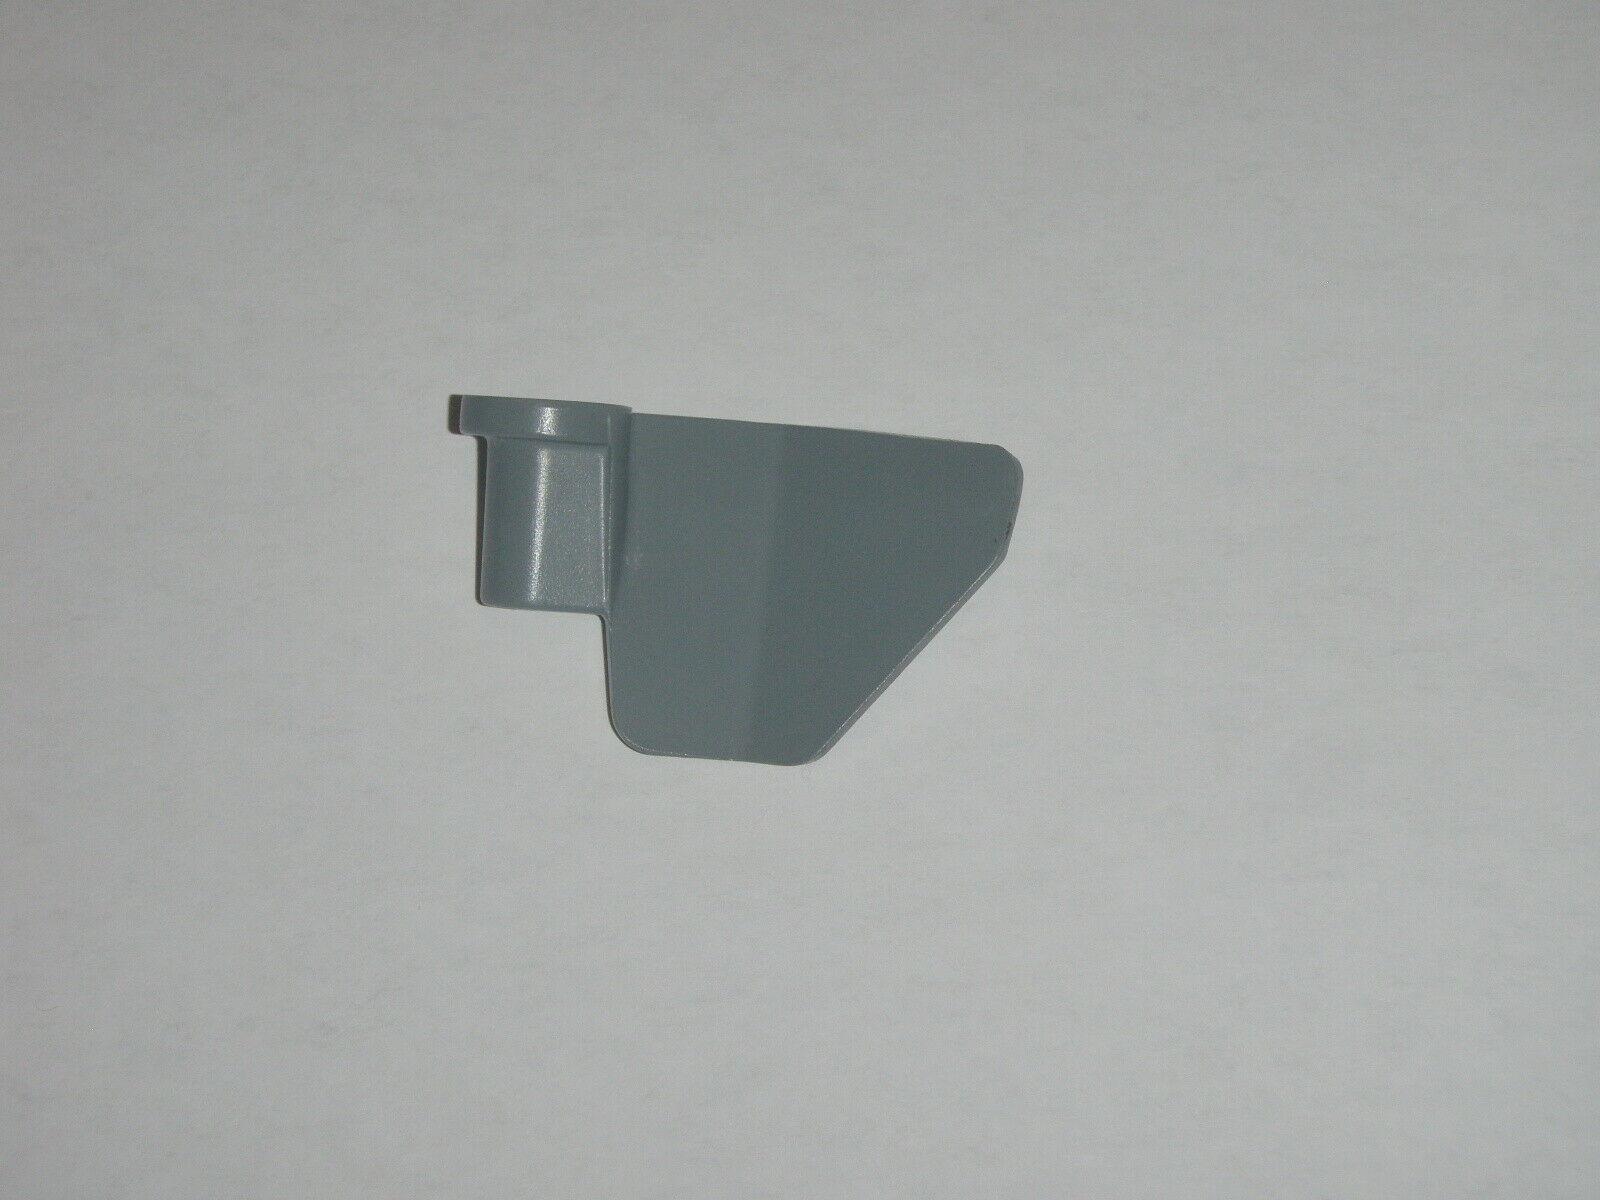 Farberware Bread Maker Machine Original Paddle for Models FTR700 (OEM) FTR700DL image 7